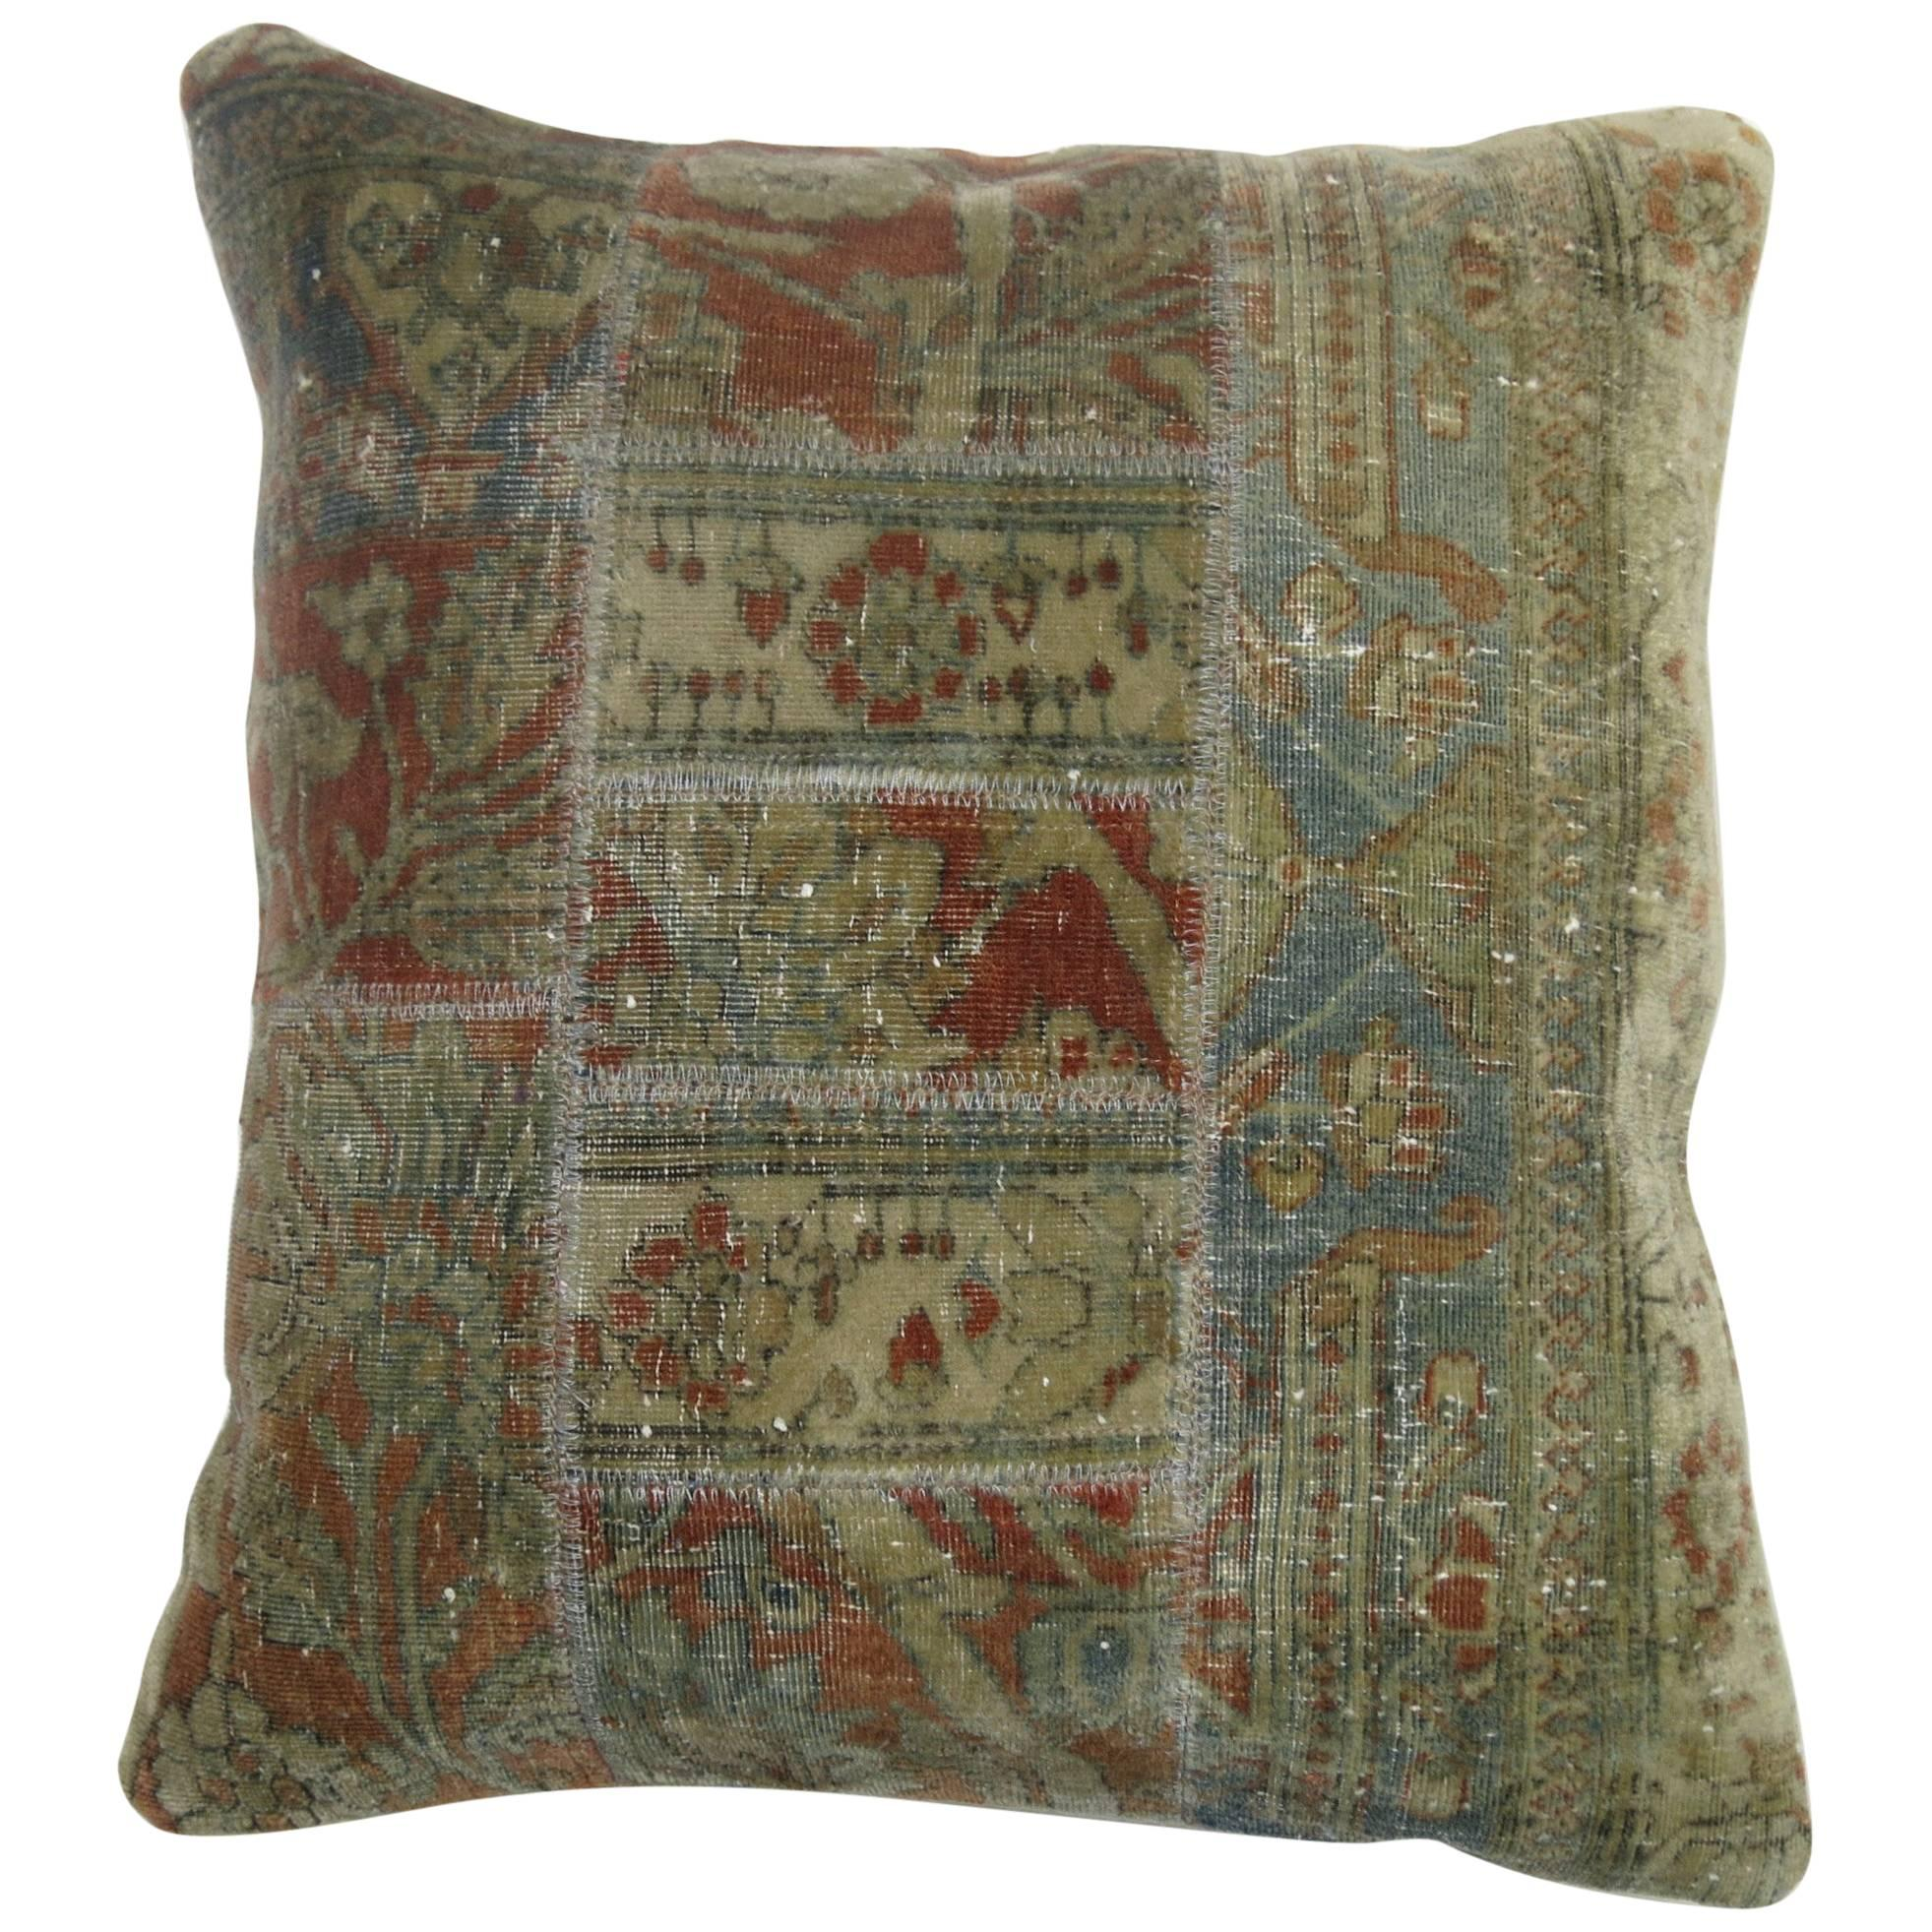 Mohtasham Kashan Persian Patchwork Rug Pillow